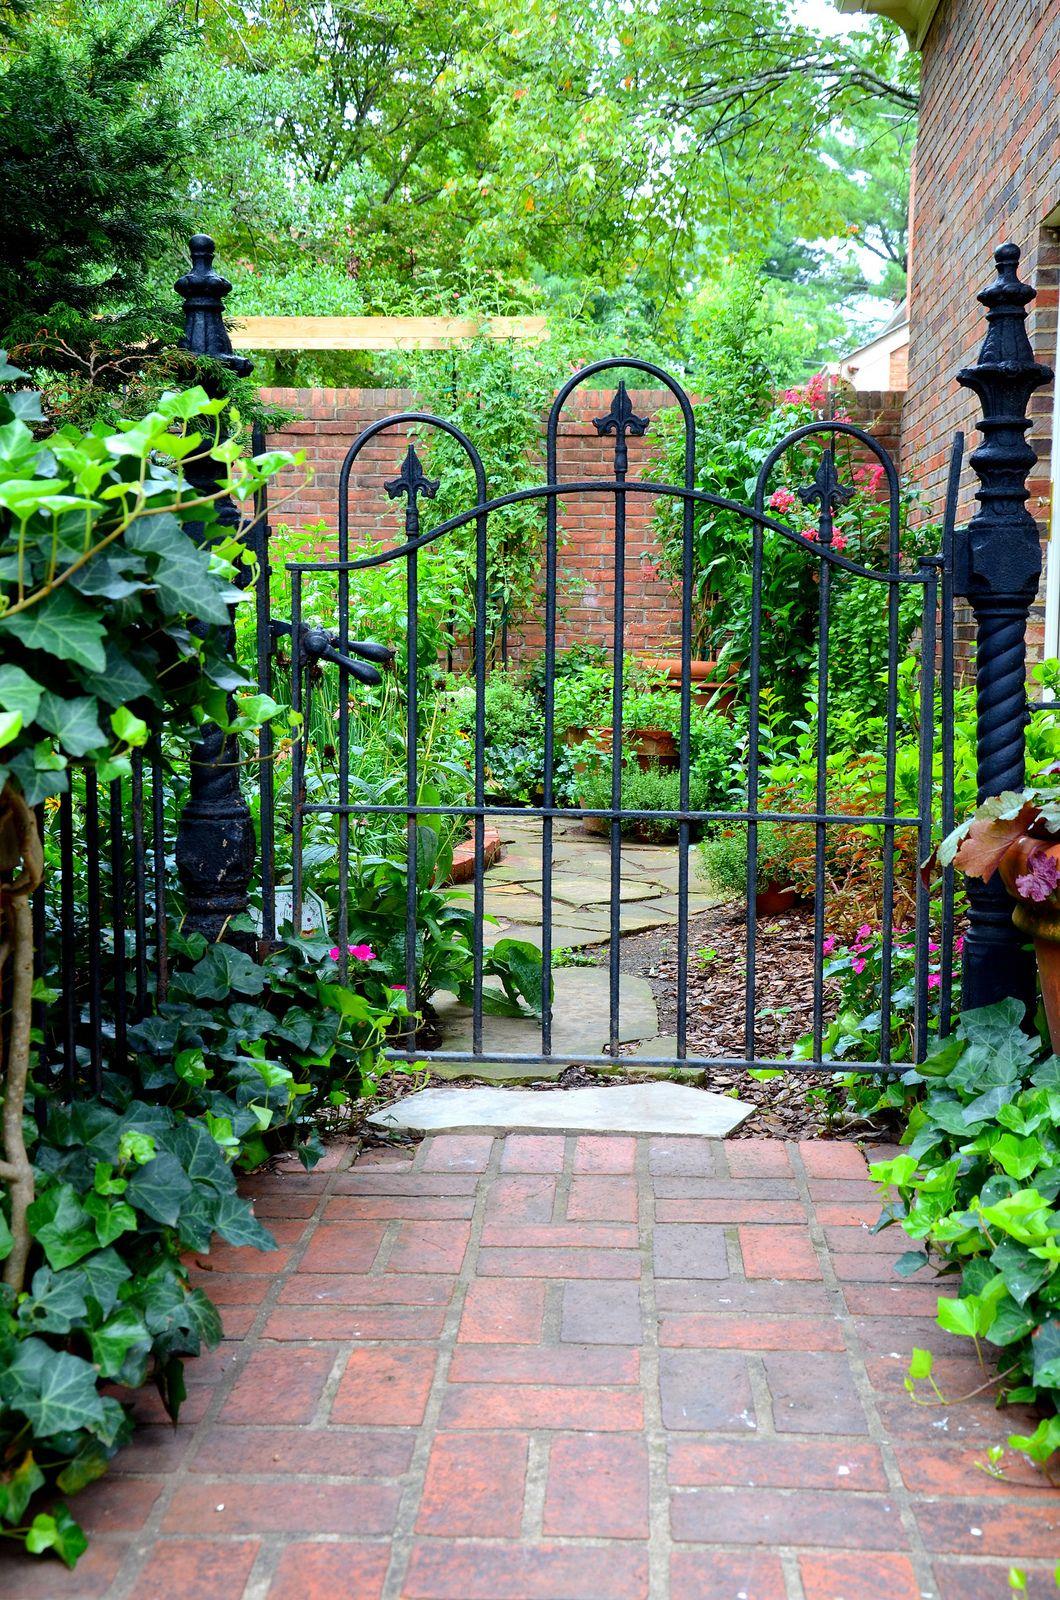 Oak Hill Gc Nashville Tennessee Patio Garden Design Small Outdoor Kitchen Design Garden Design London